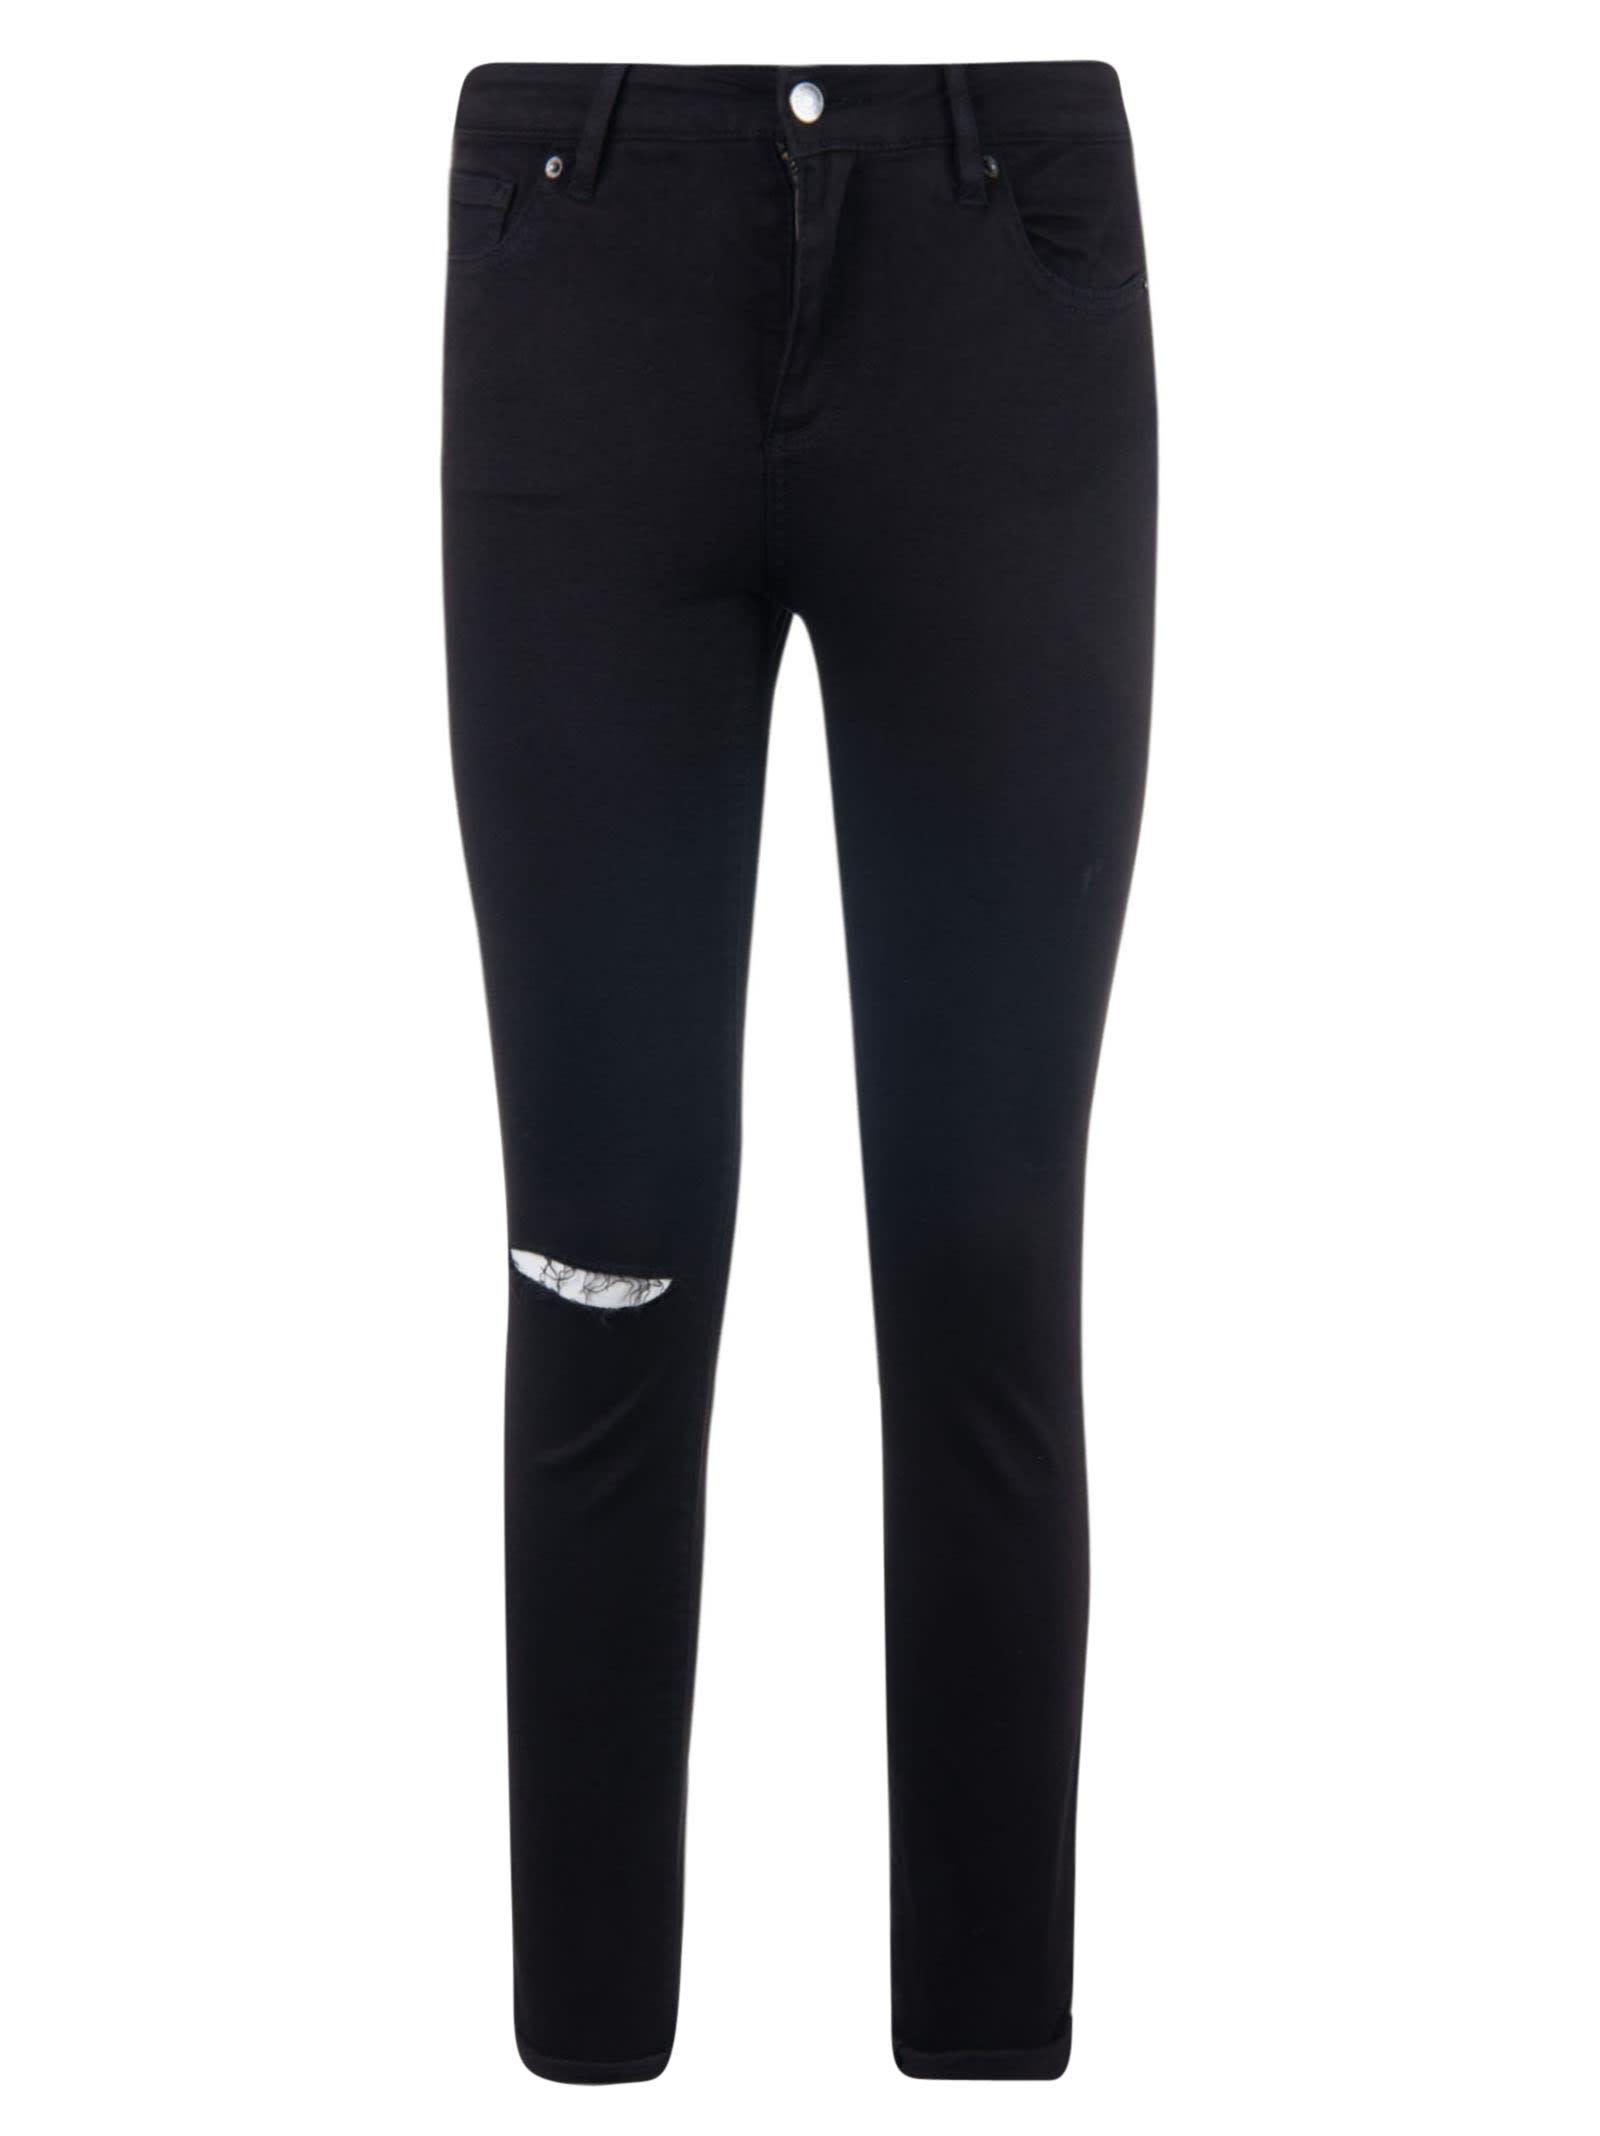 brand new e0701 f6035 Armani Collezioni Super Skinny Shredded Powerstretch Jeans